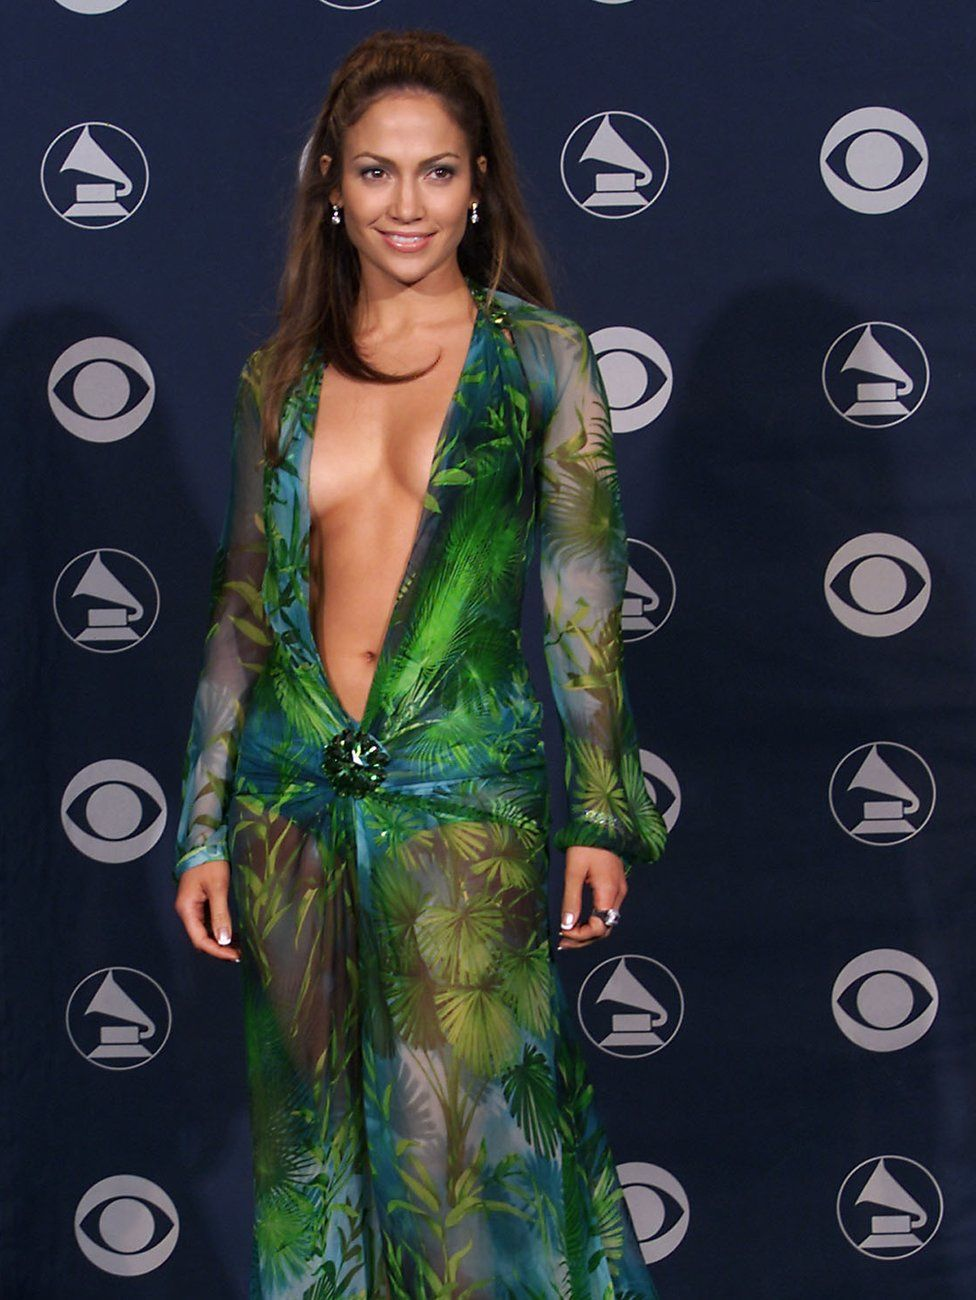 Jennifer Lopez in the original Versace dress at the Grammy Awards, February 2000